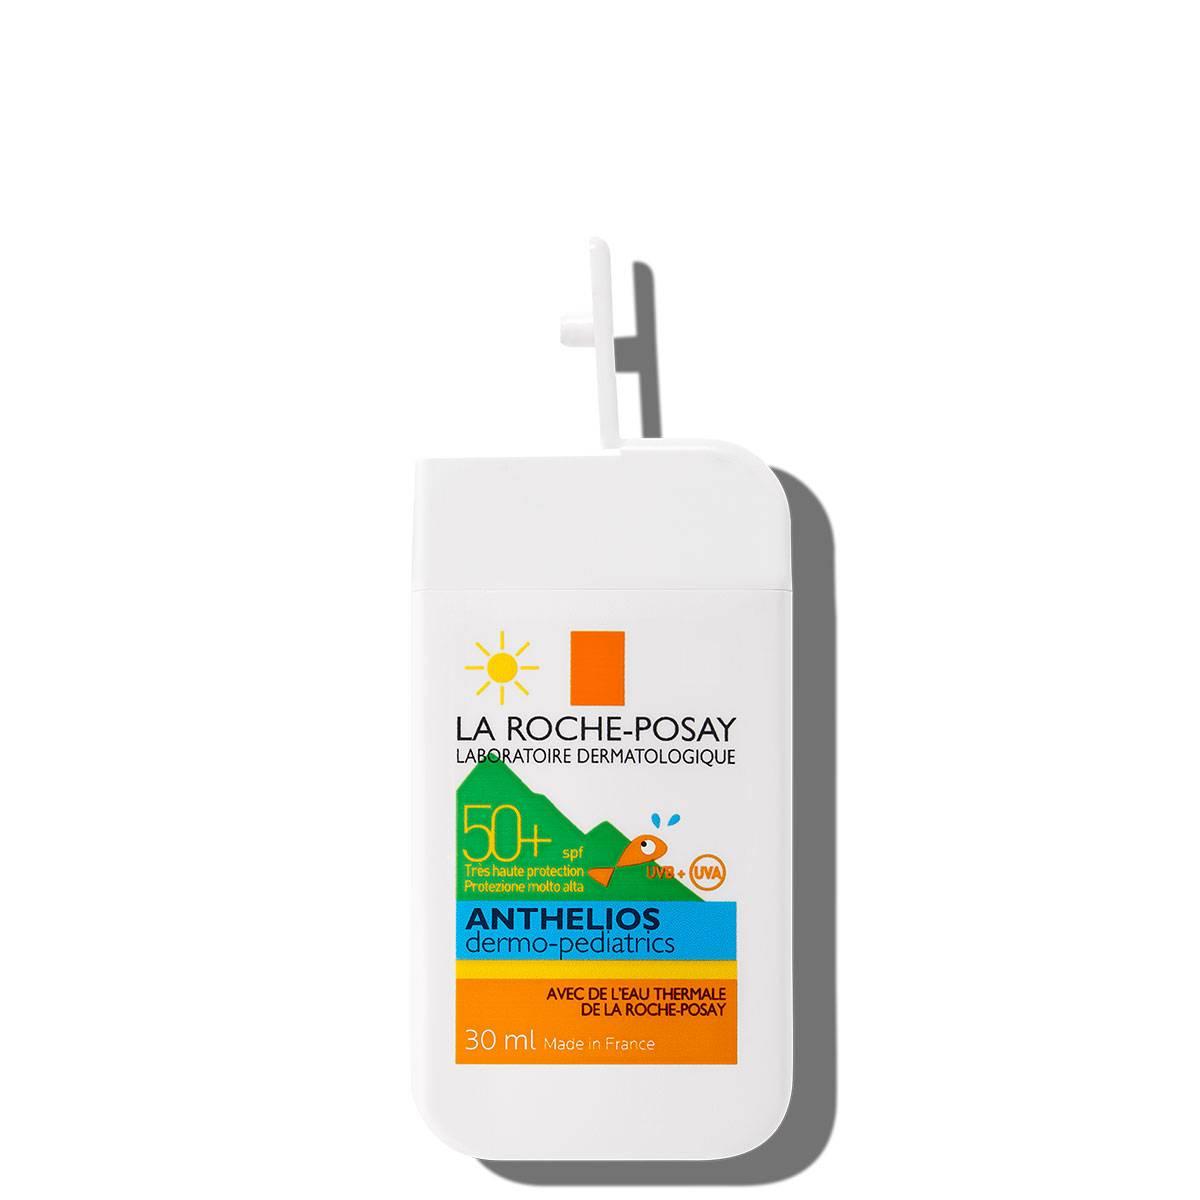 La Roche Posay ProduktSide Sol Anthelios Lomme Dermo Pædiatri Lotio